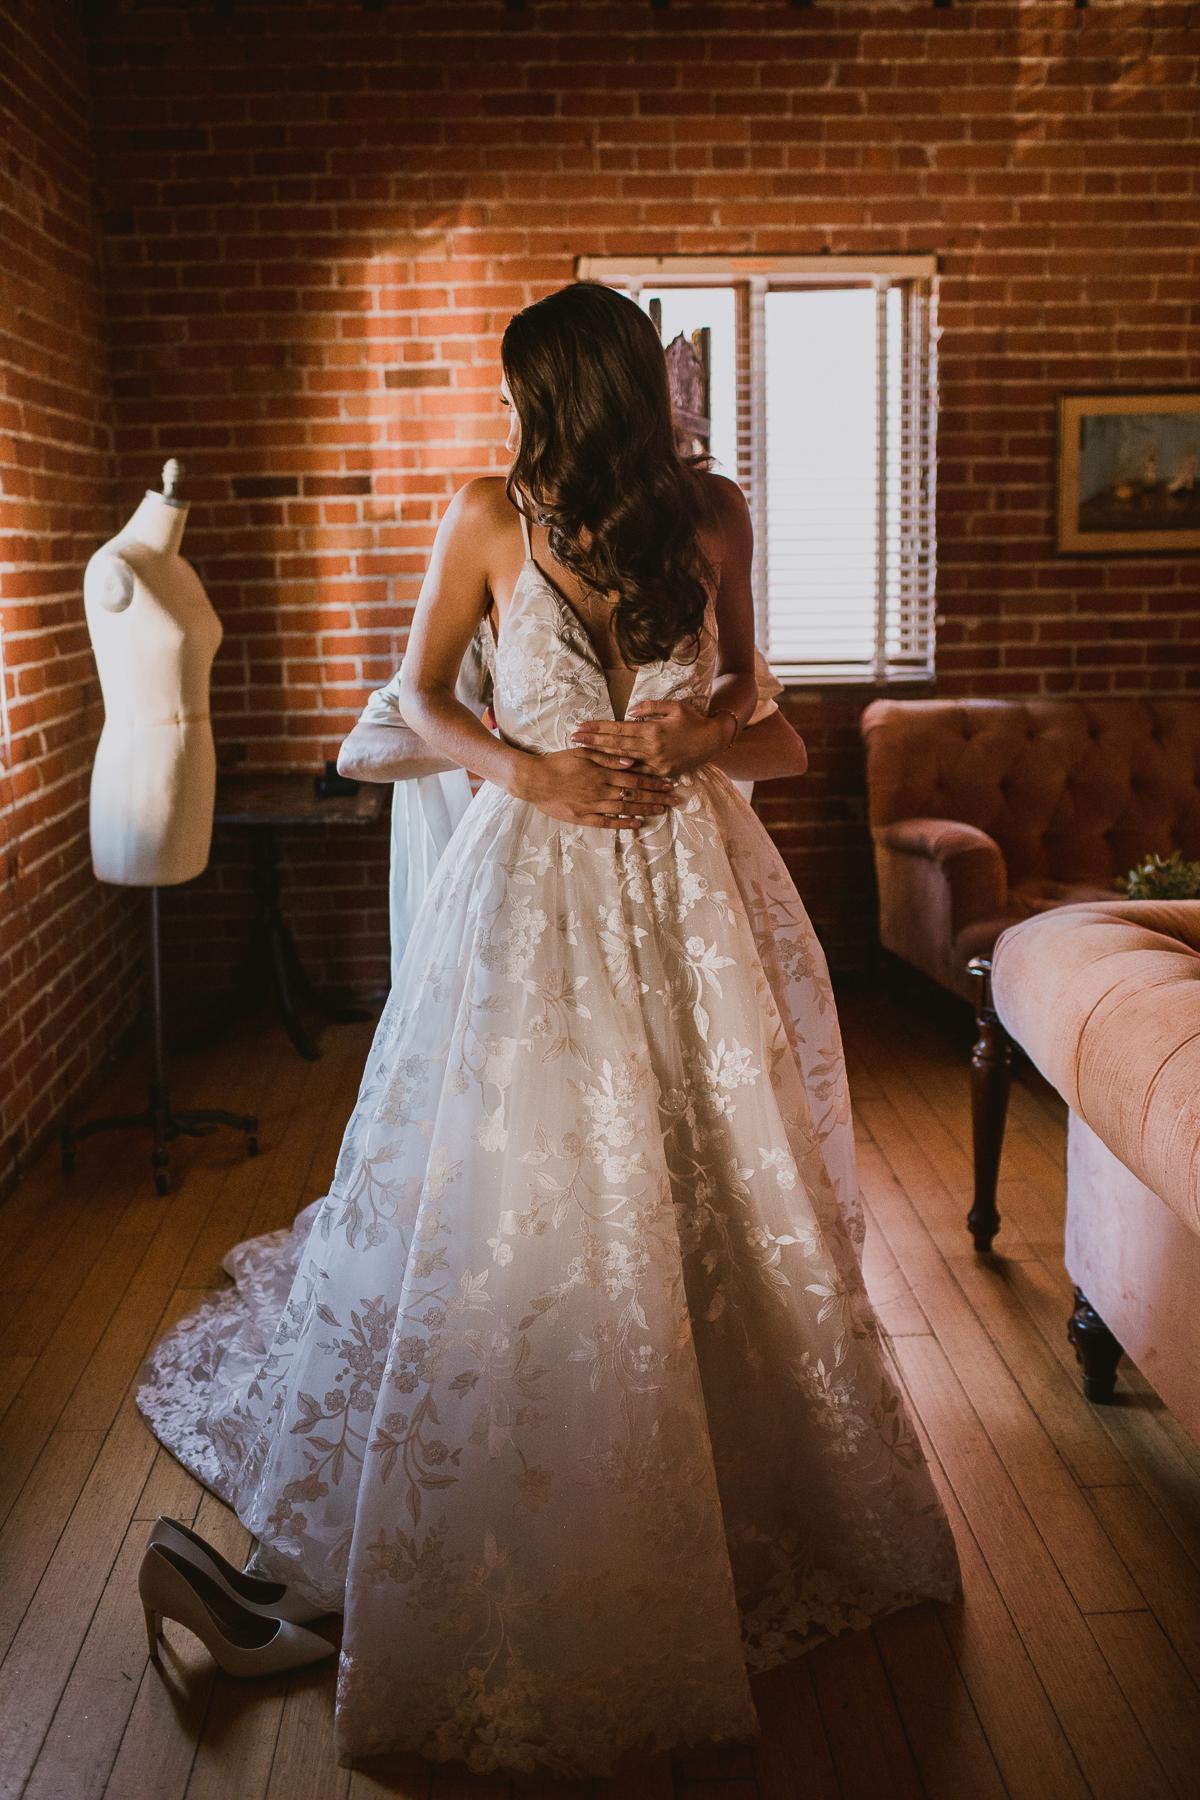 carondelet-house-kelley-raye-los-angeles-wedding-photographer-4.jpg